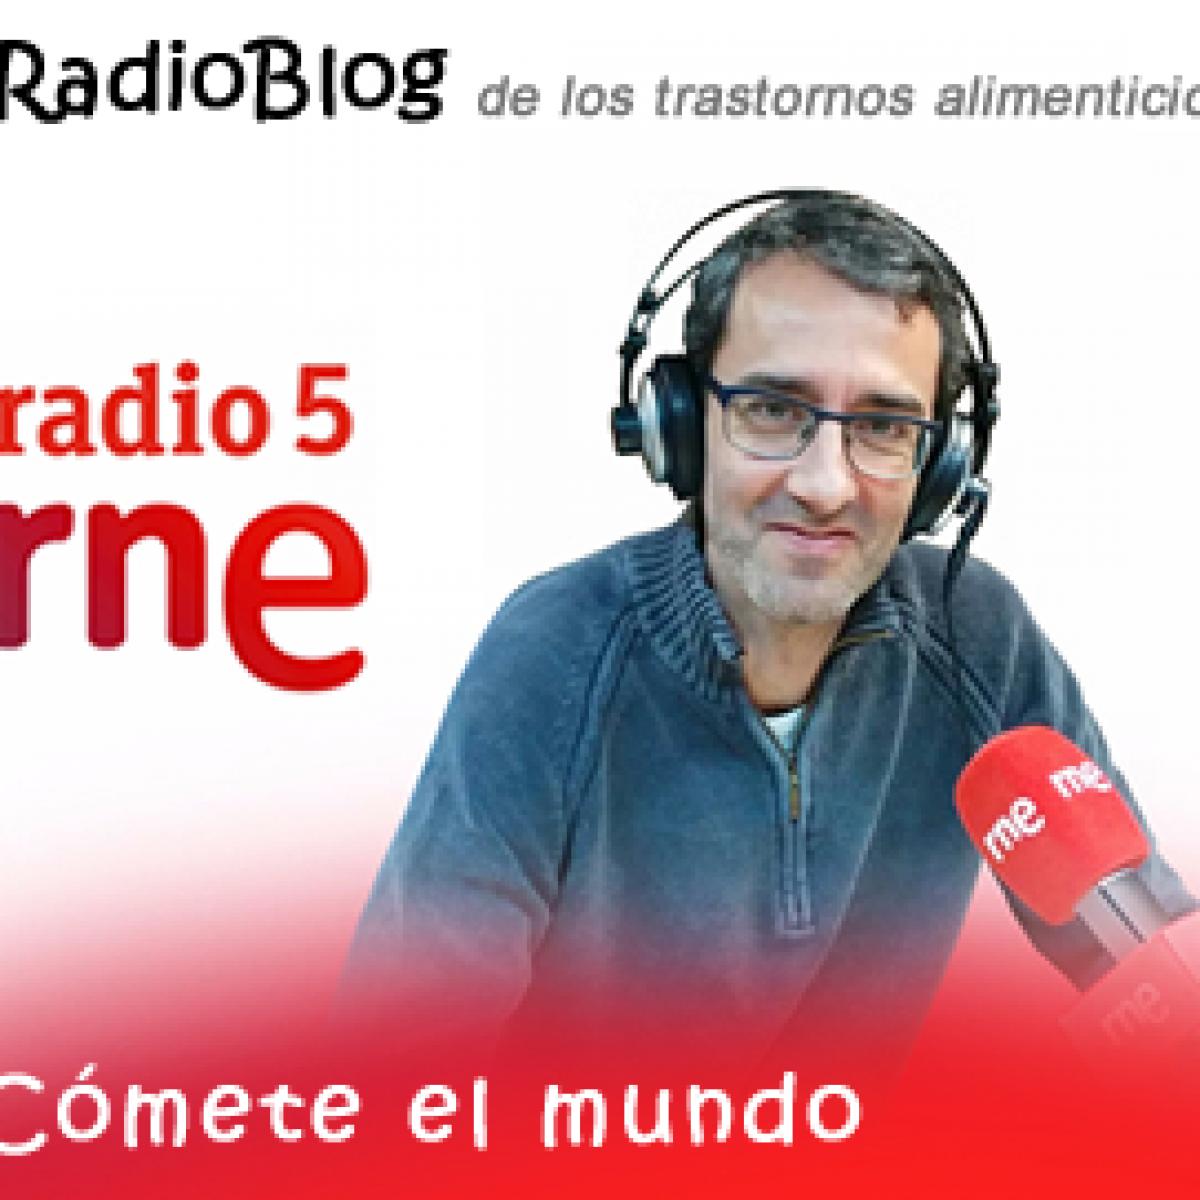 radioblog.fw